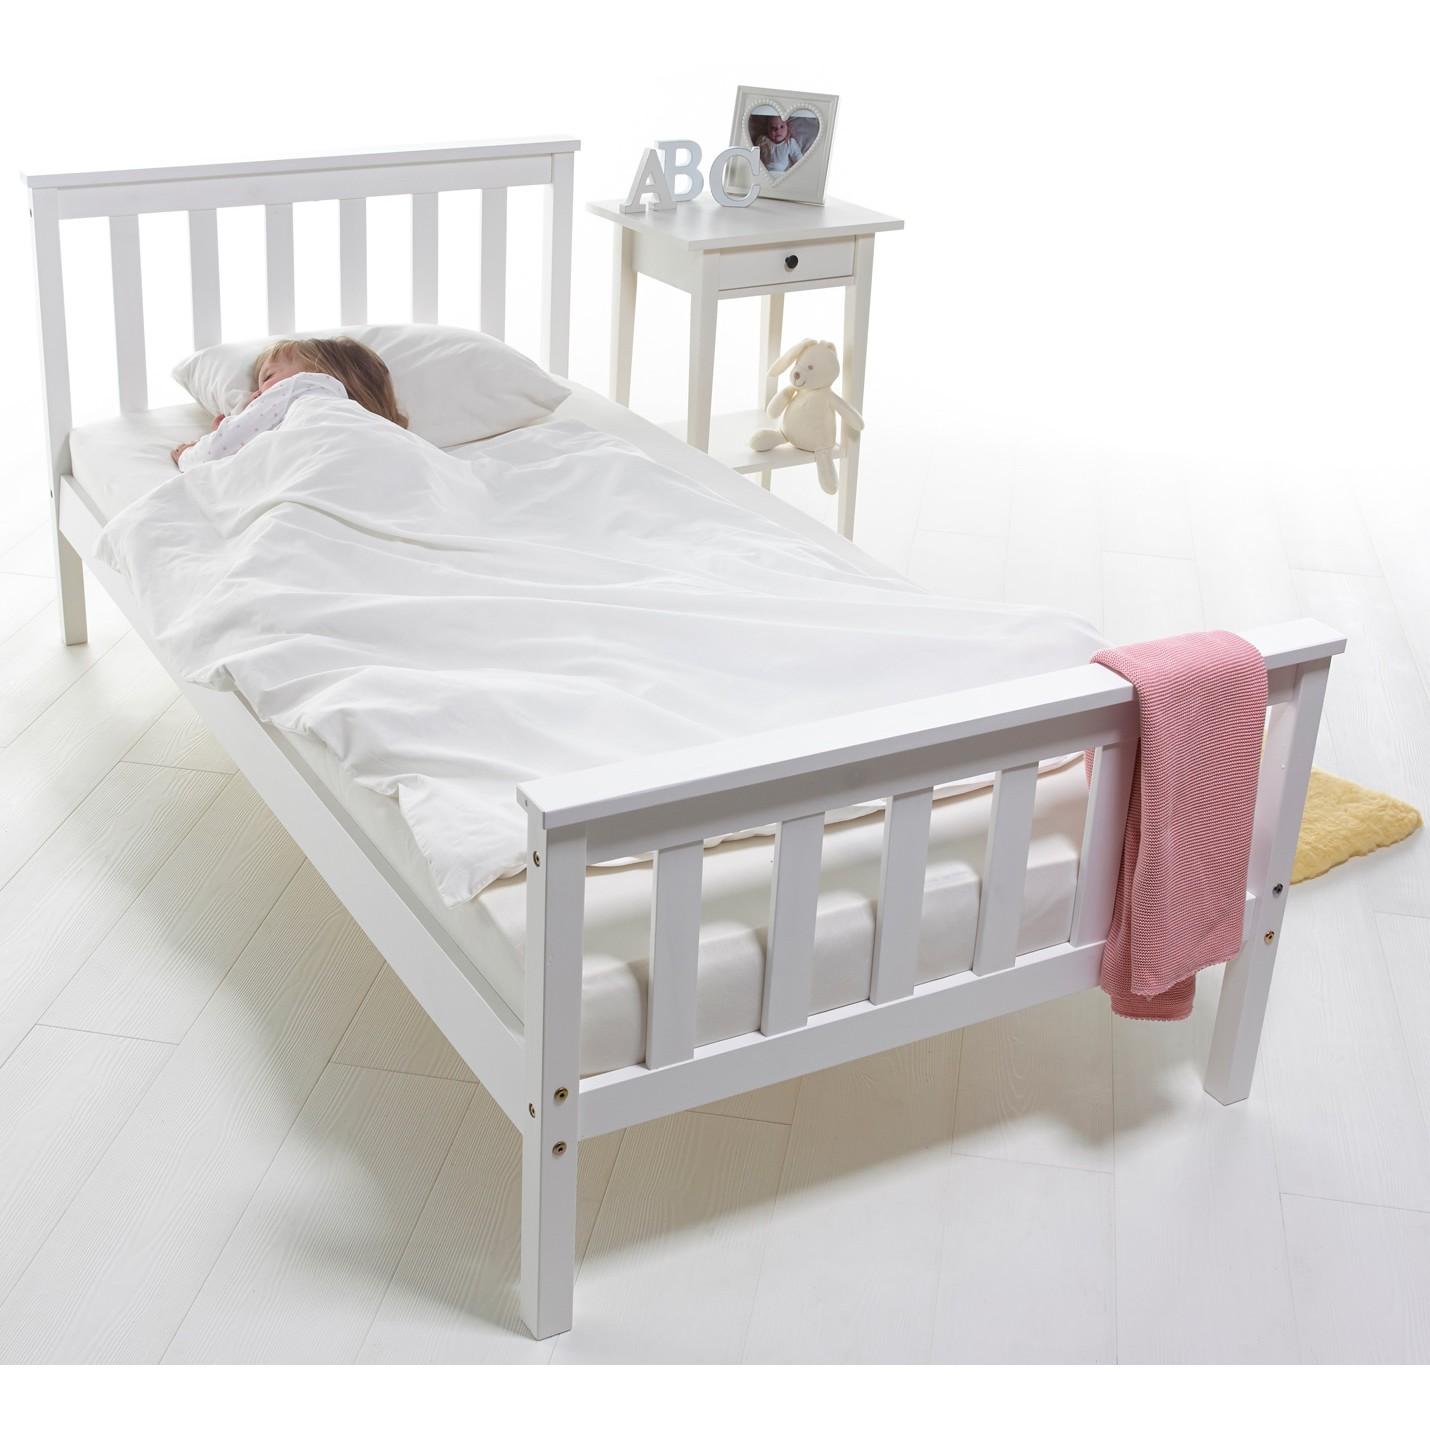 natural junior single mattress 90x200cm. Black Bedroom Furniture Sets. Home Design Ideas